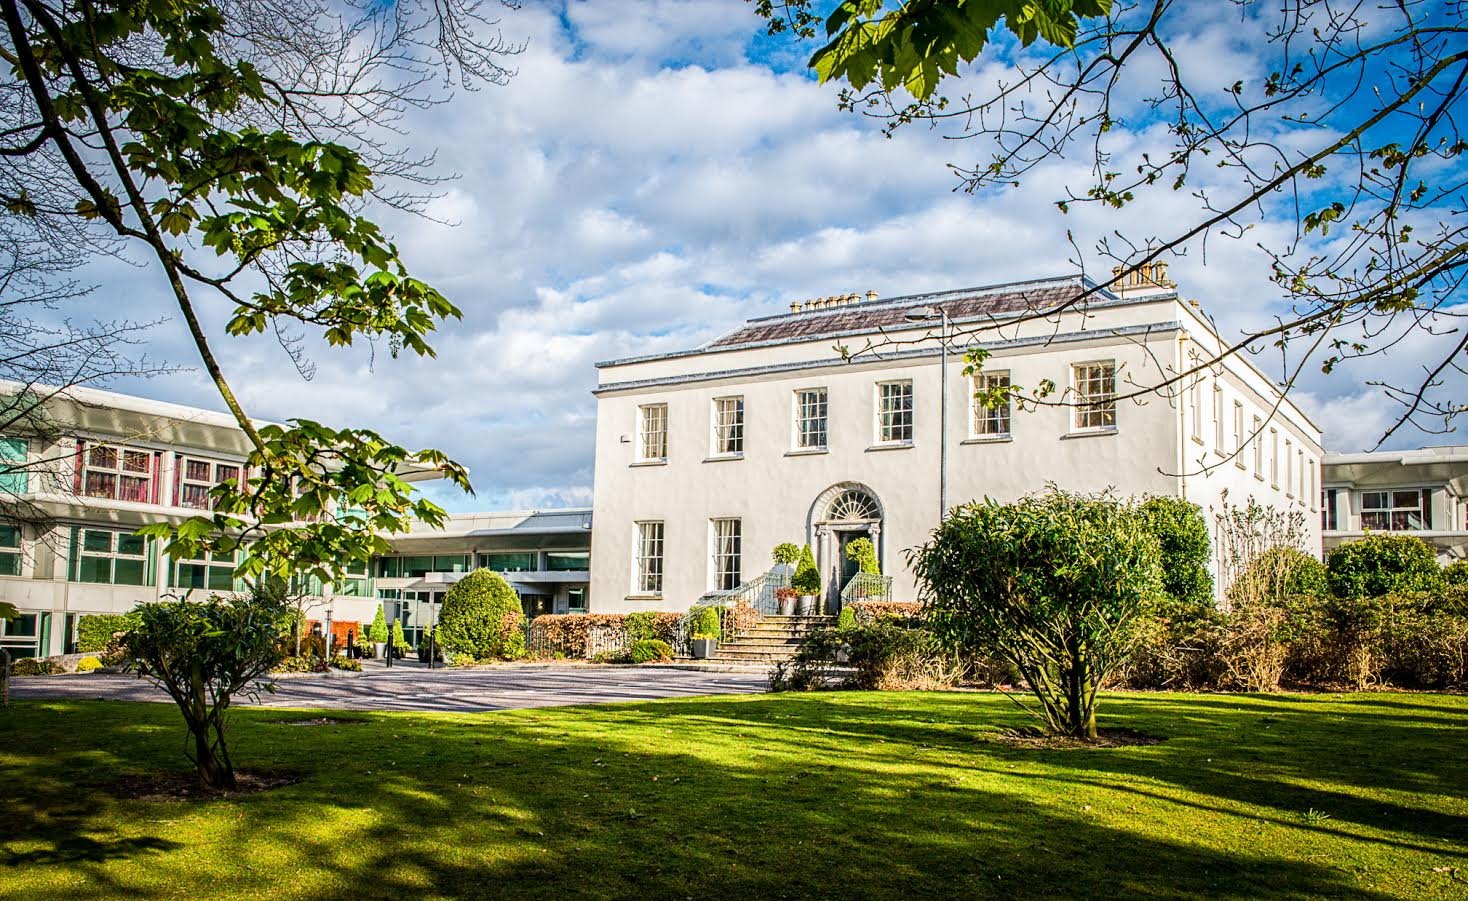 Radisson Blu Hotel & Spa Cork